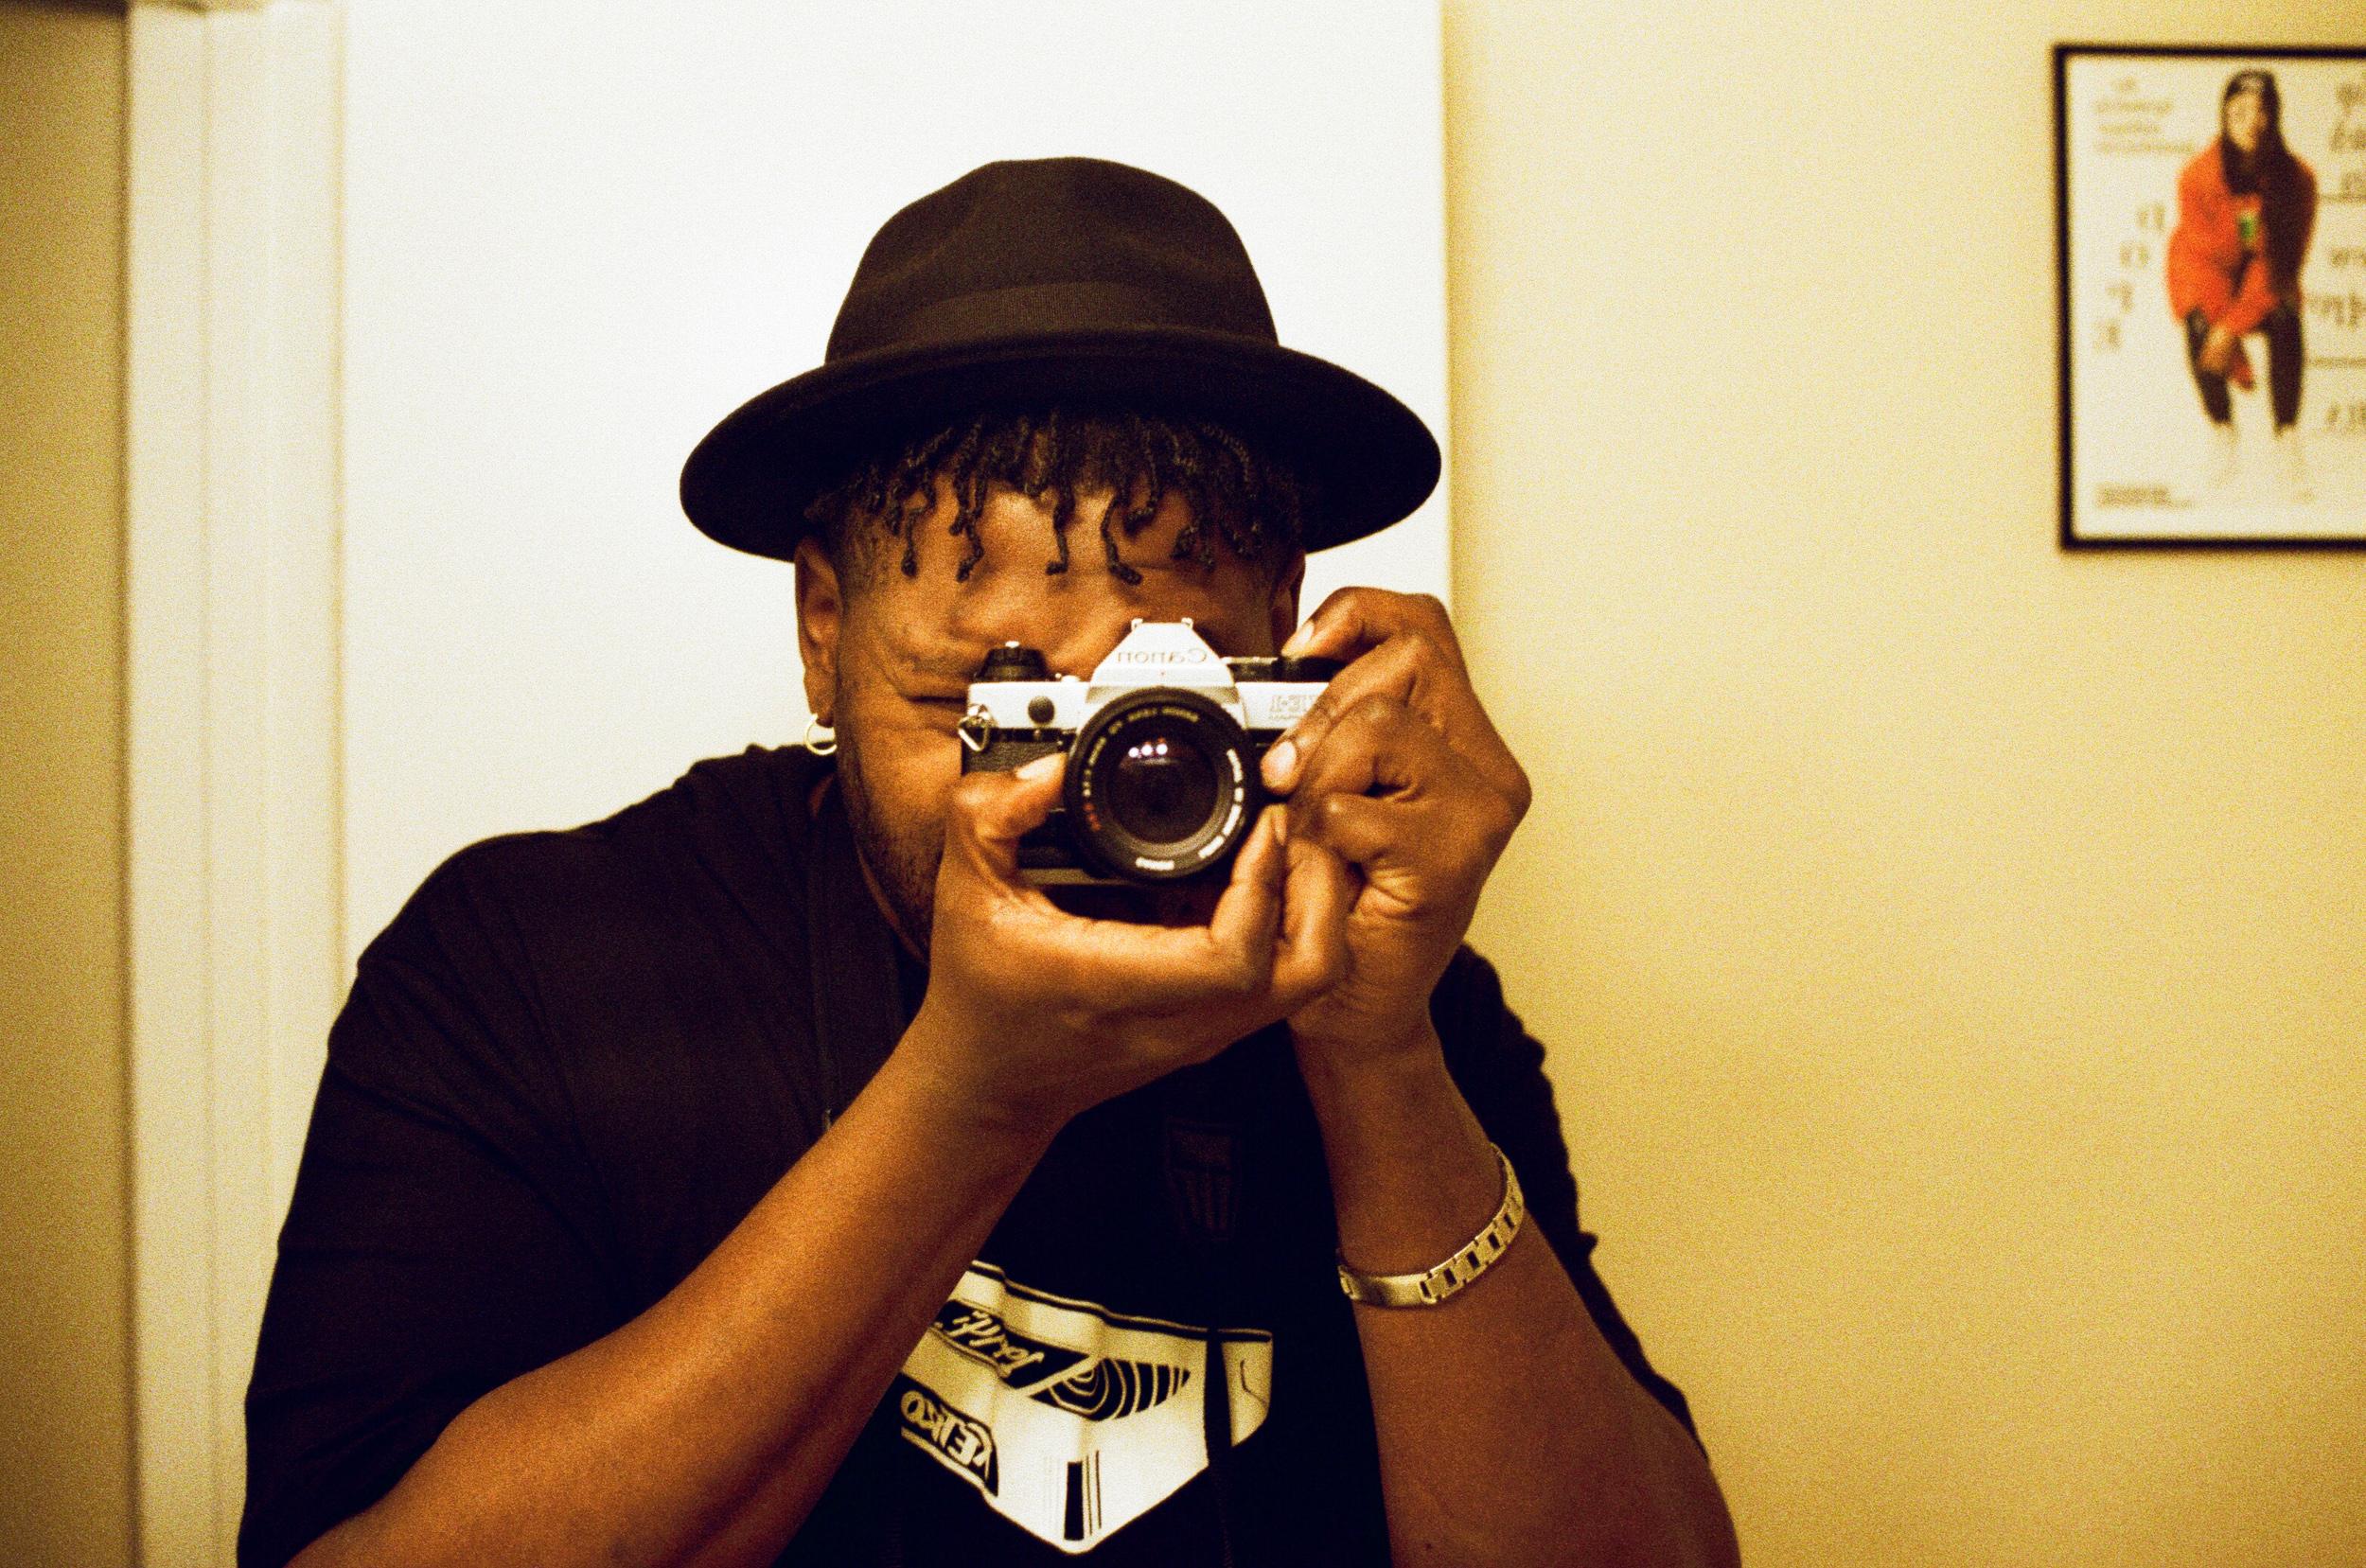 Claude Charles, Photographer, @shotsbytopnotch